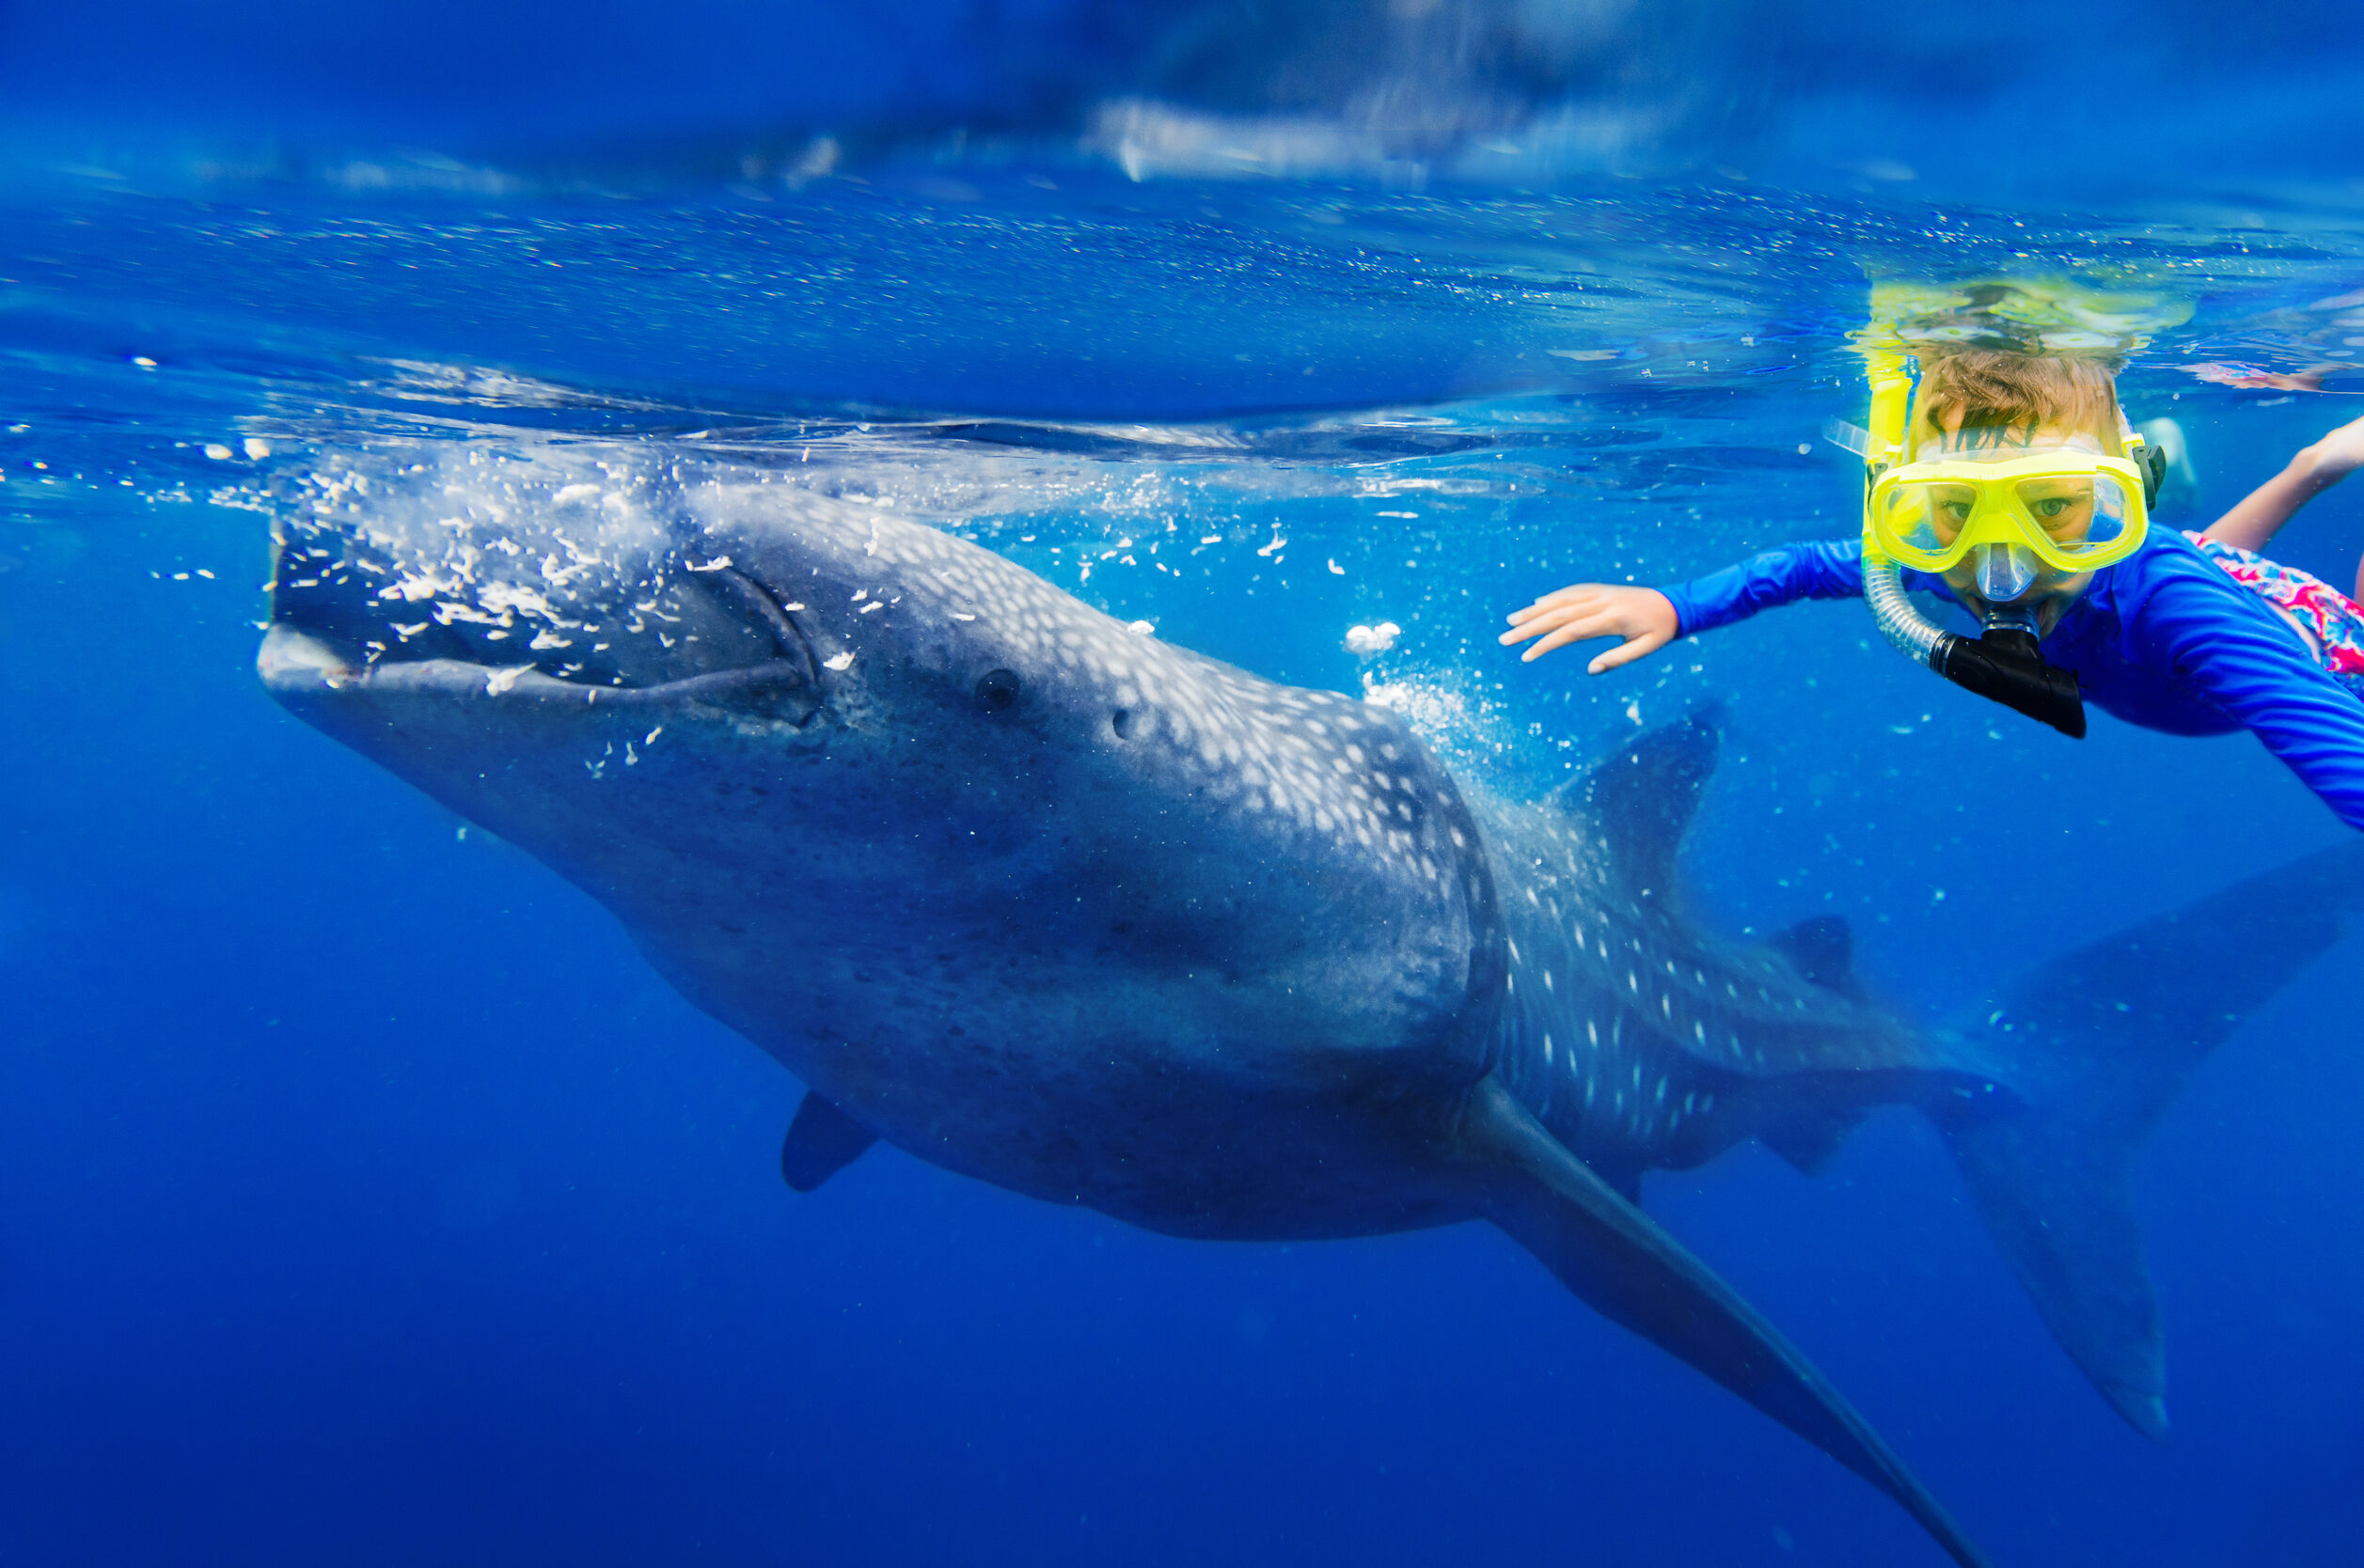 como-es-nadar-con-tiburon-ballena